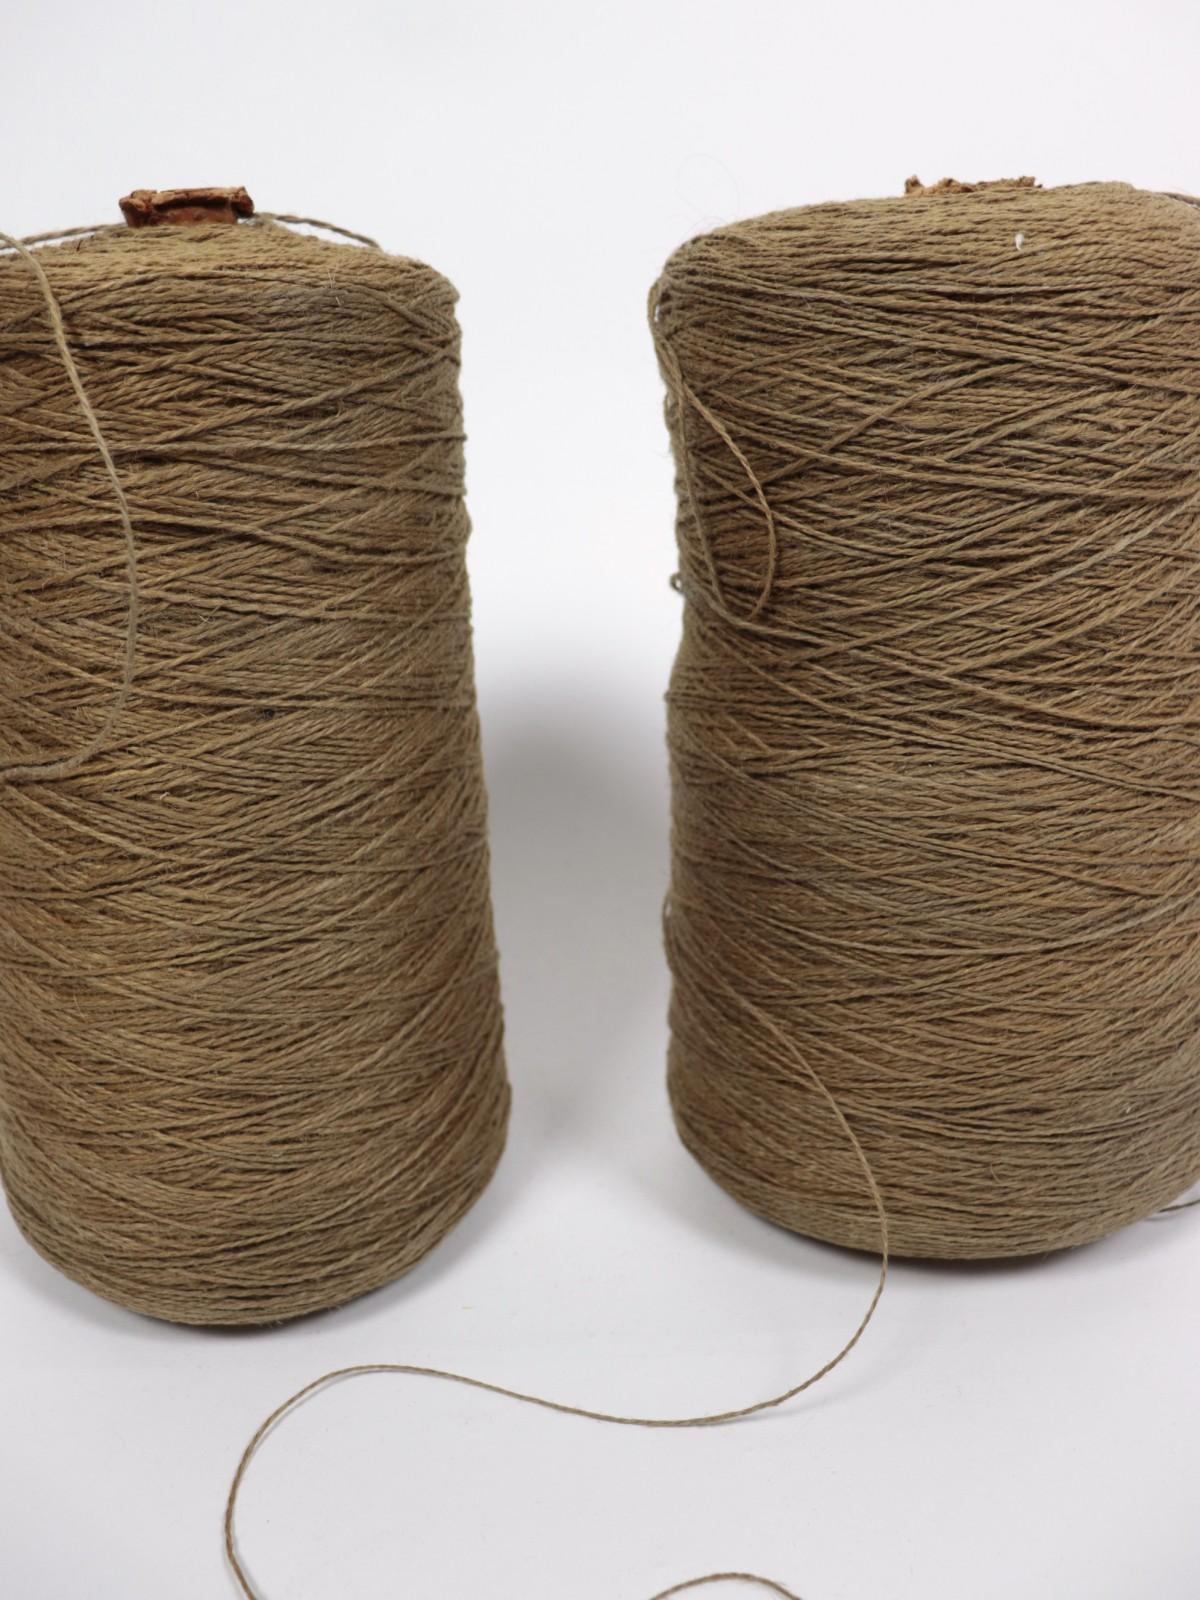 Hemp string, italy